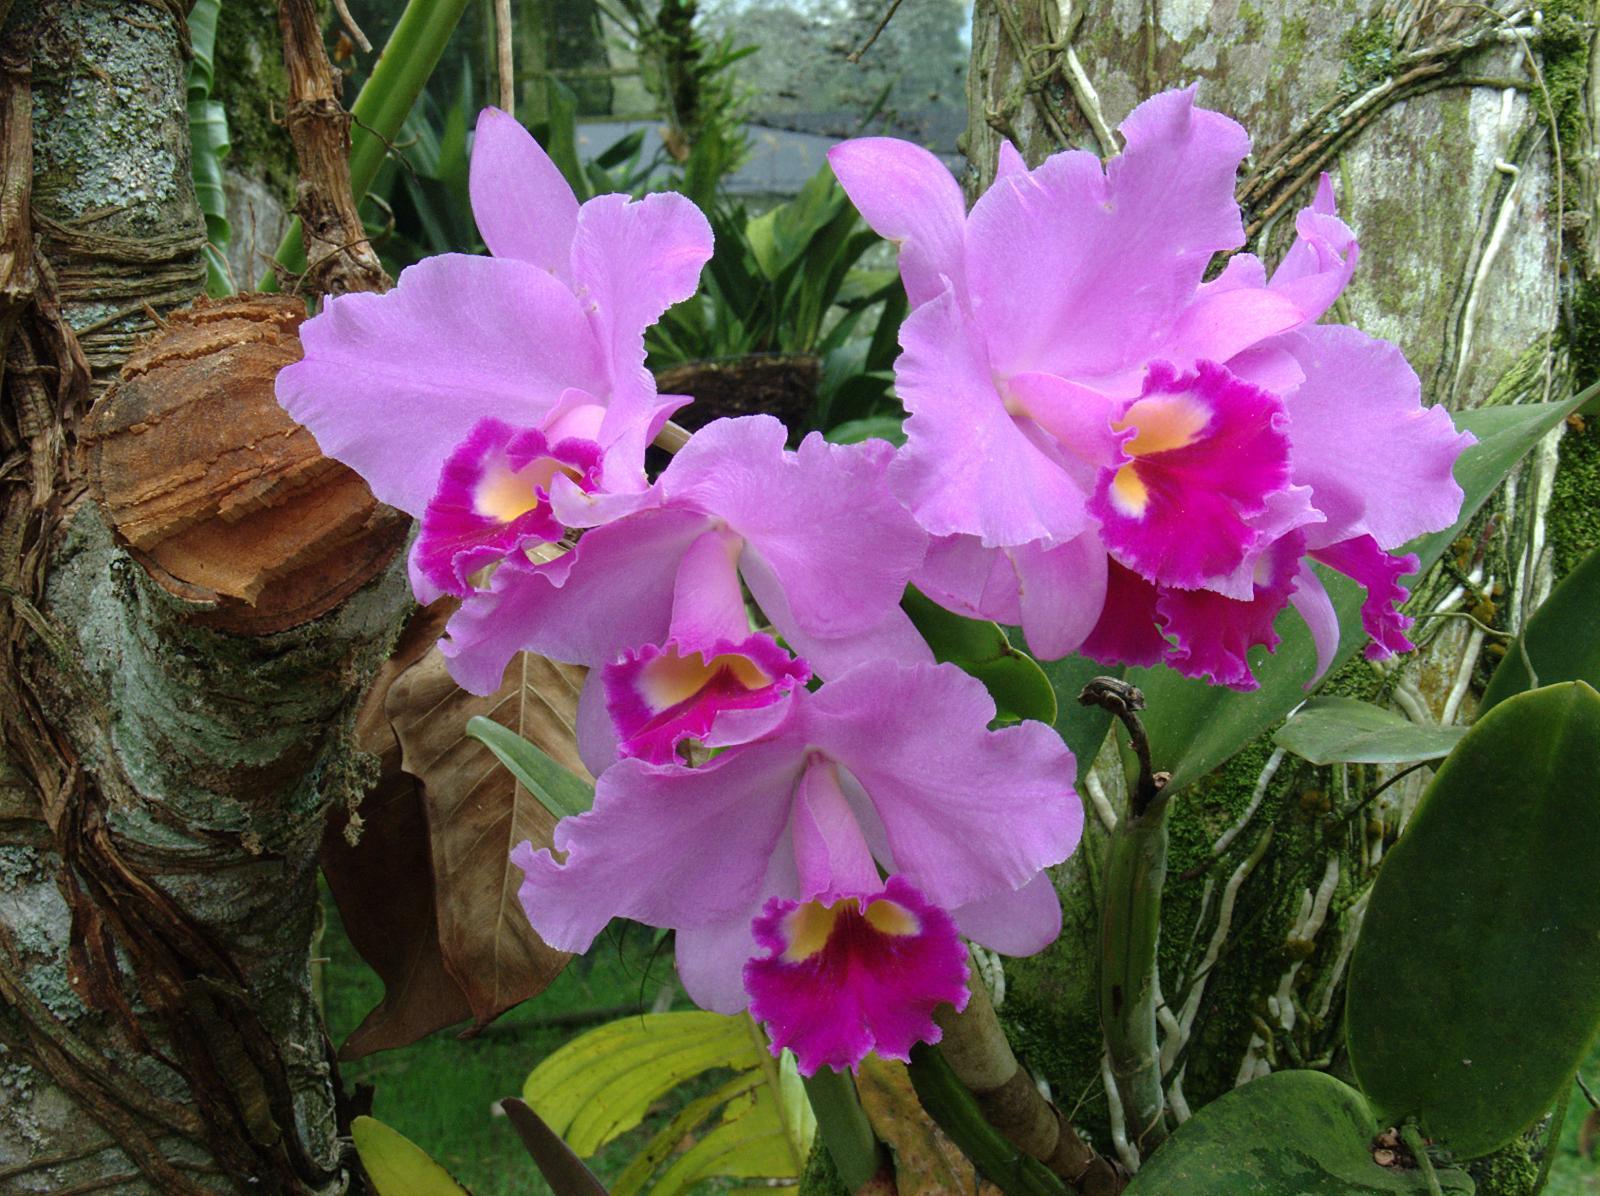 las orquideas : LAS ORQUIDEAS